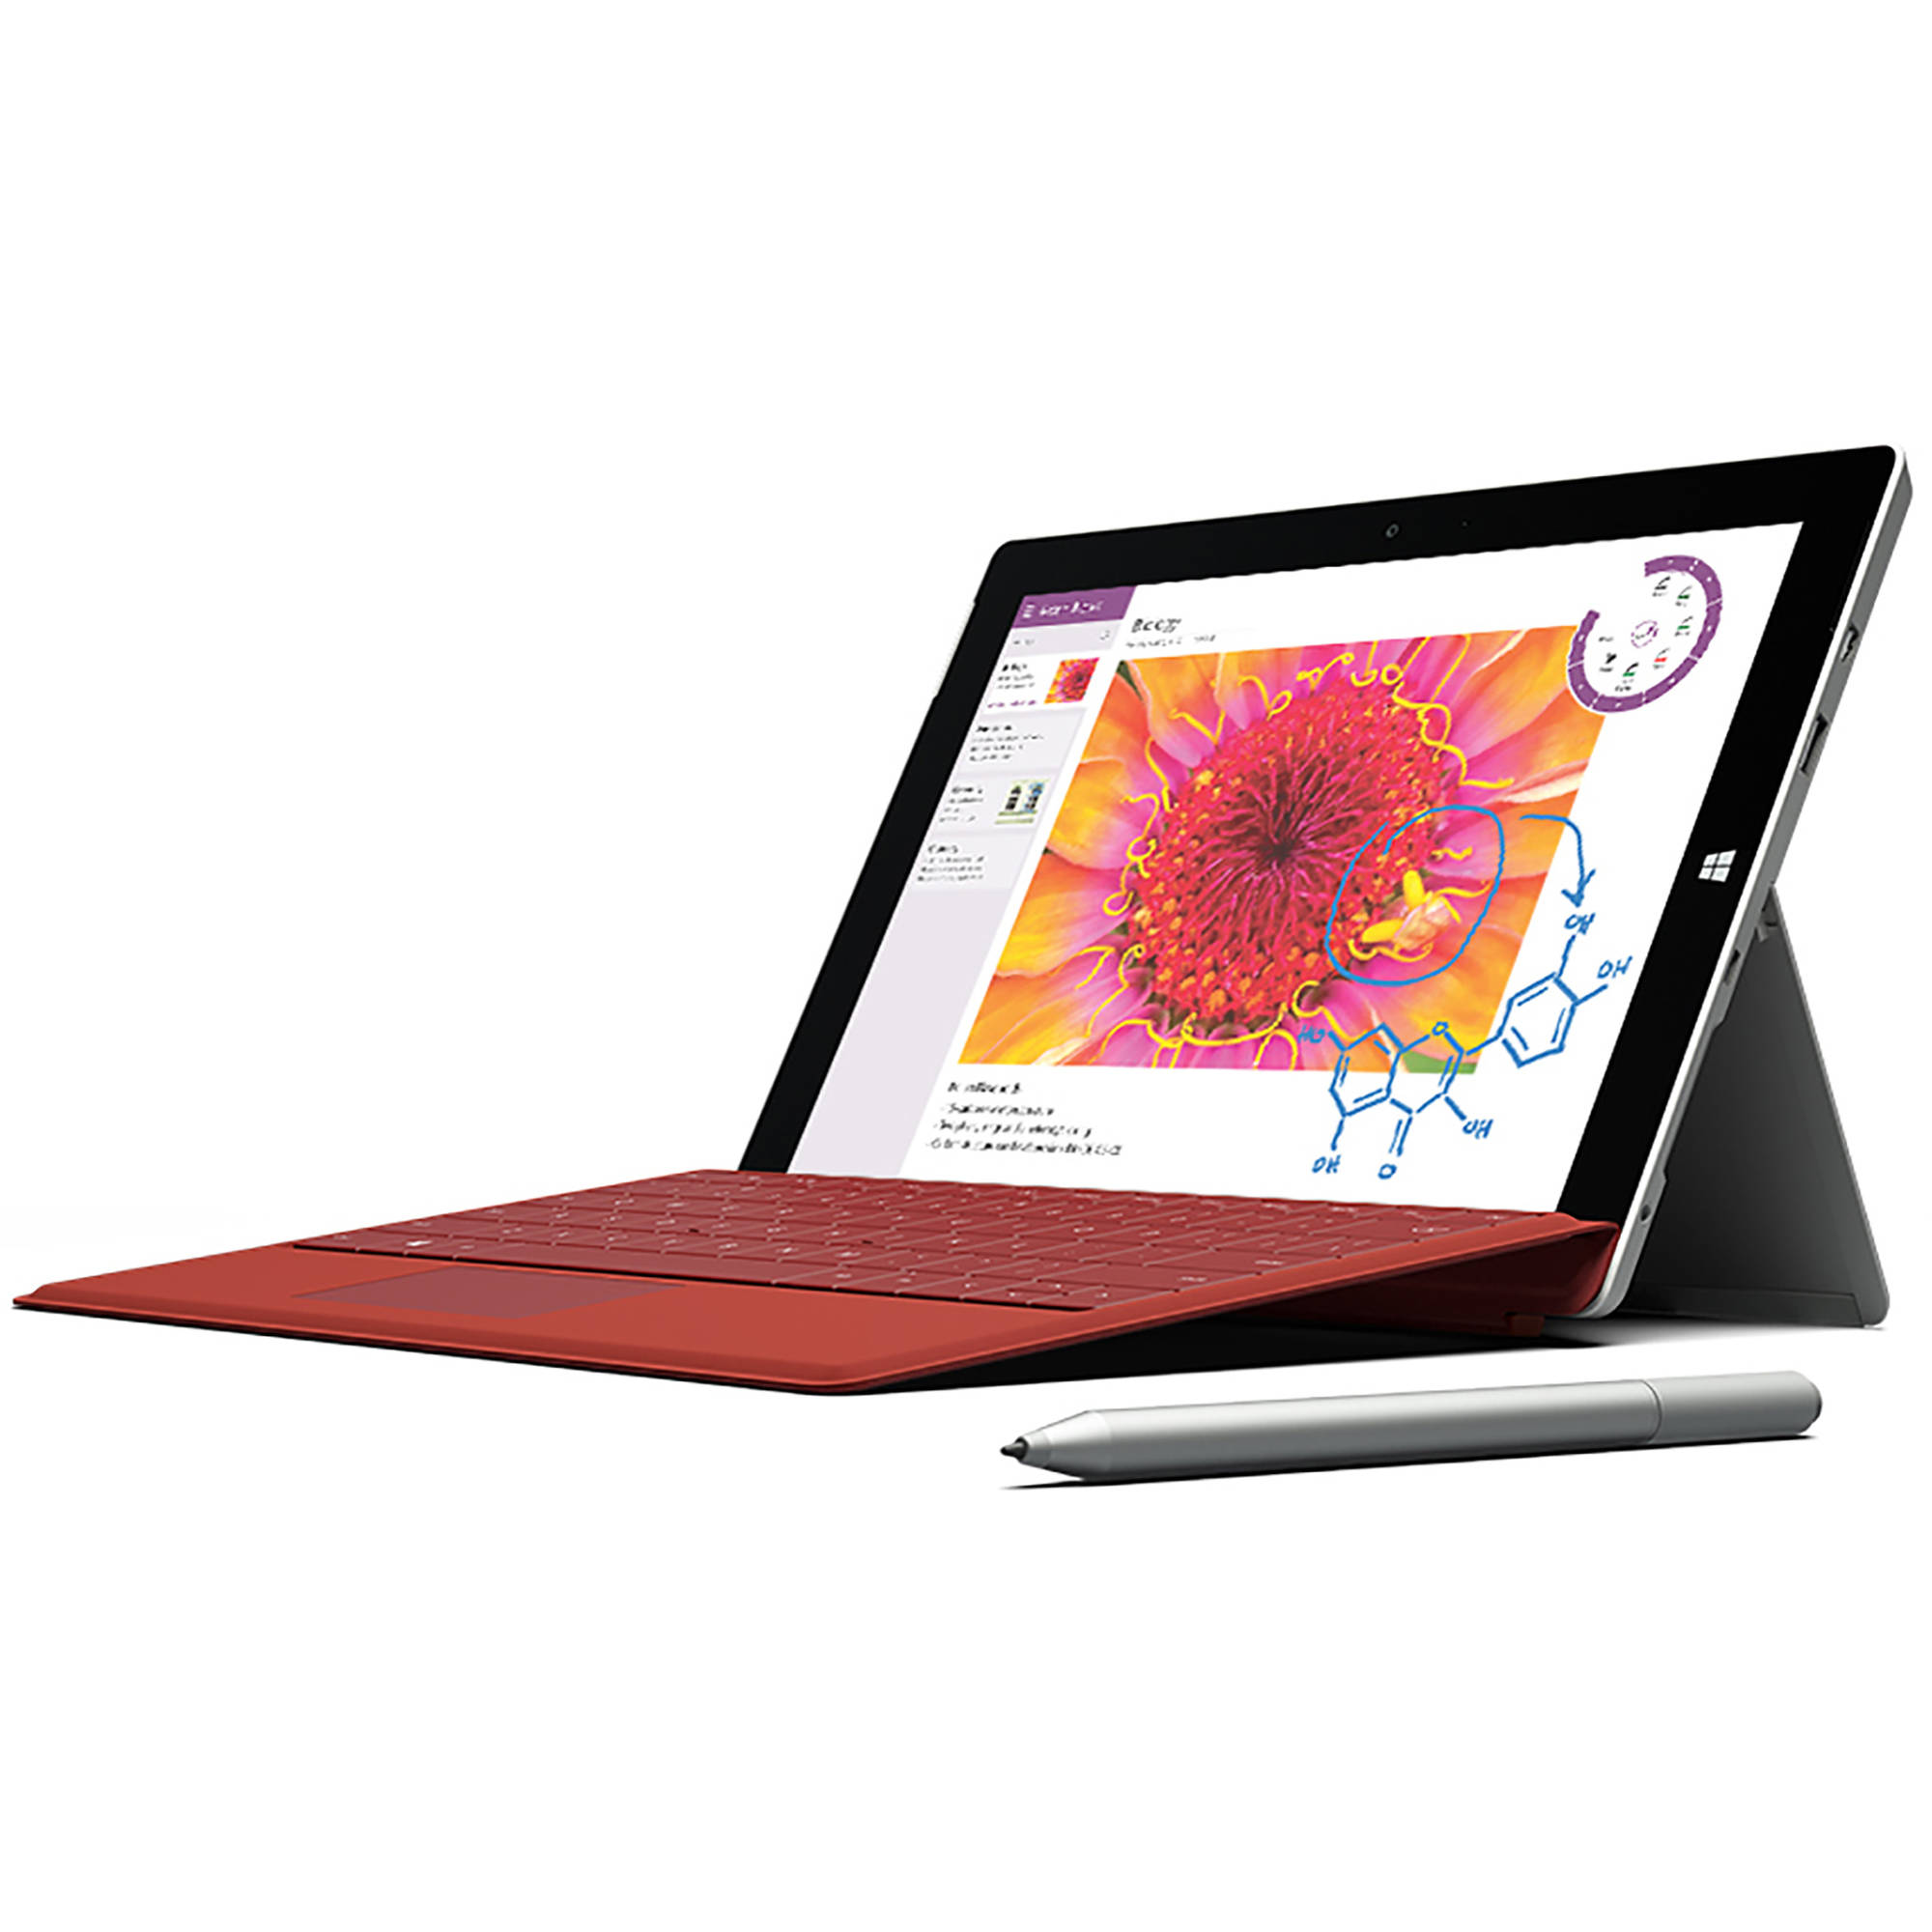 "Microsoft Surface 3 10.8"" Tablet 64GB Intel Atom x7 Z8700 Quad-Core Processor, Windows 10"